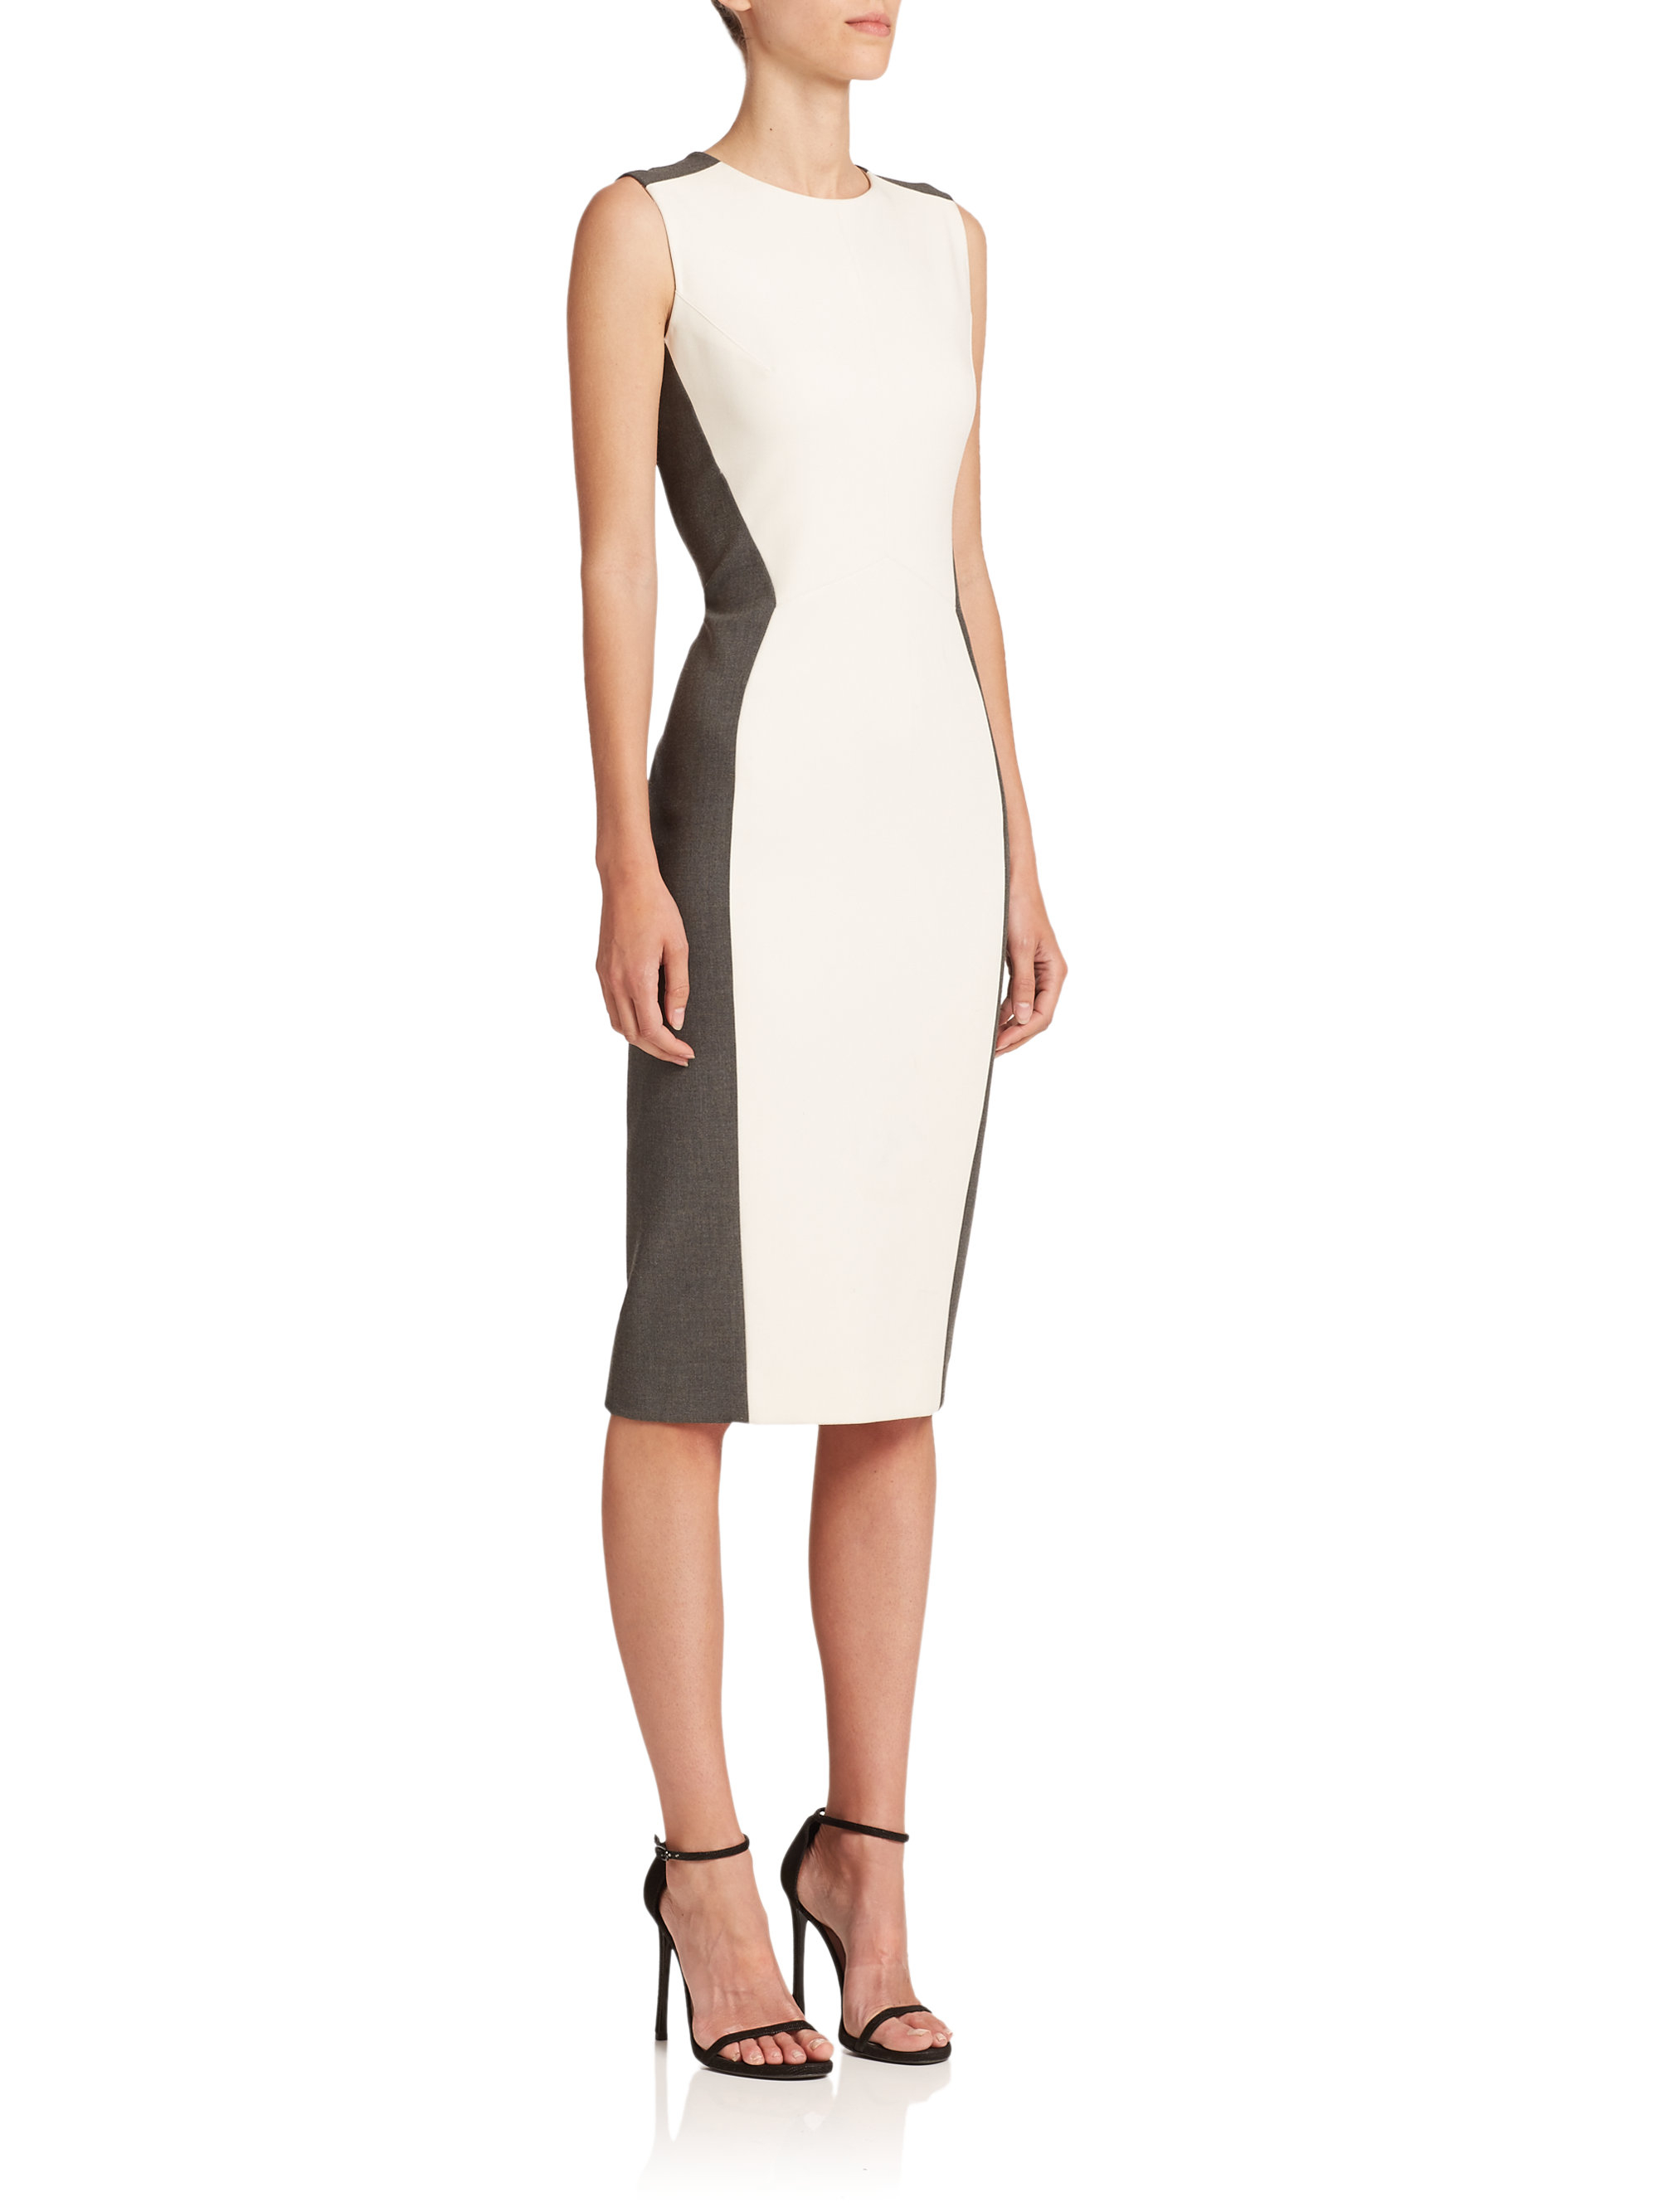 59393e75 Narciso Rodriguez Colorblock Sheath Dress in Gray - Lyst